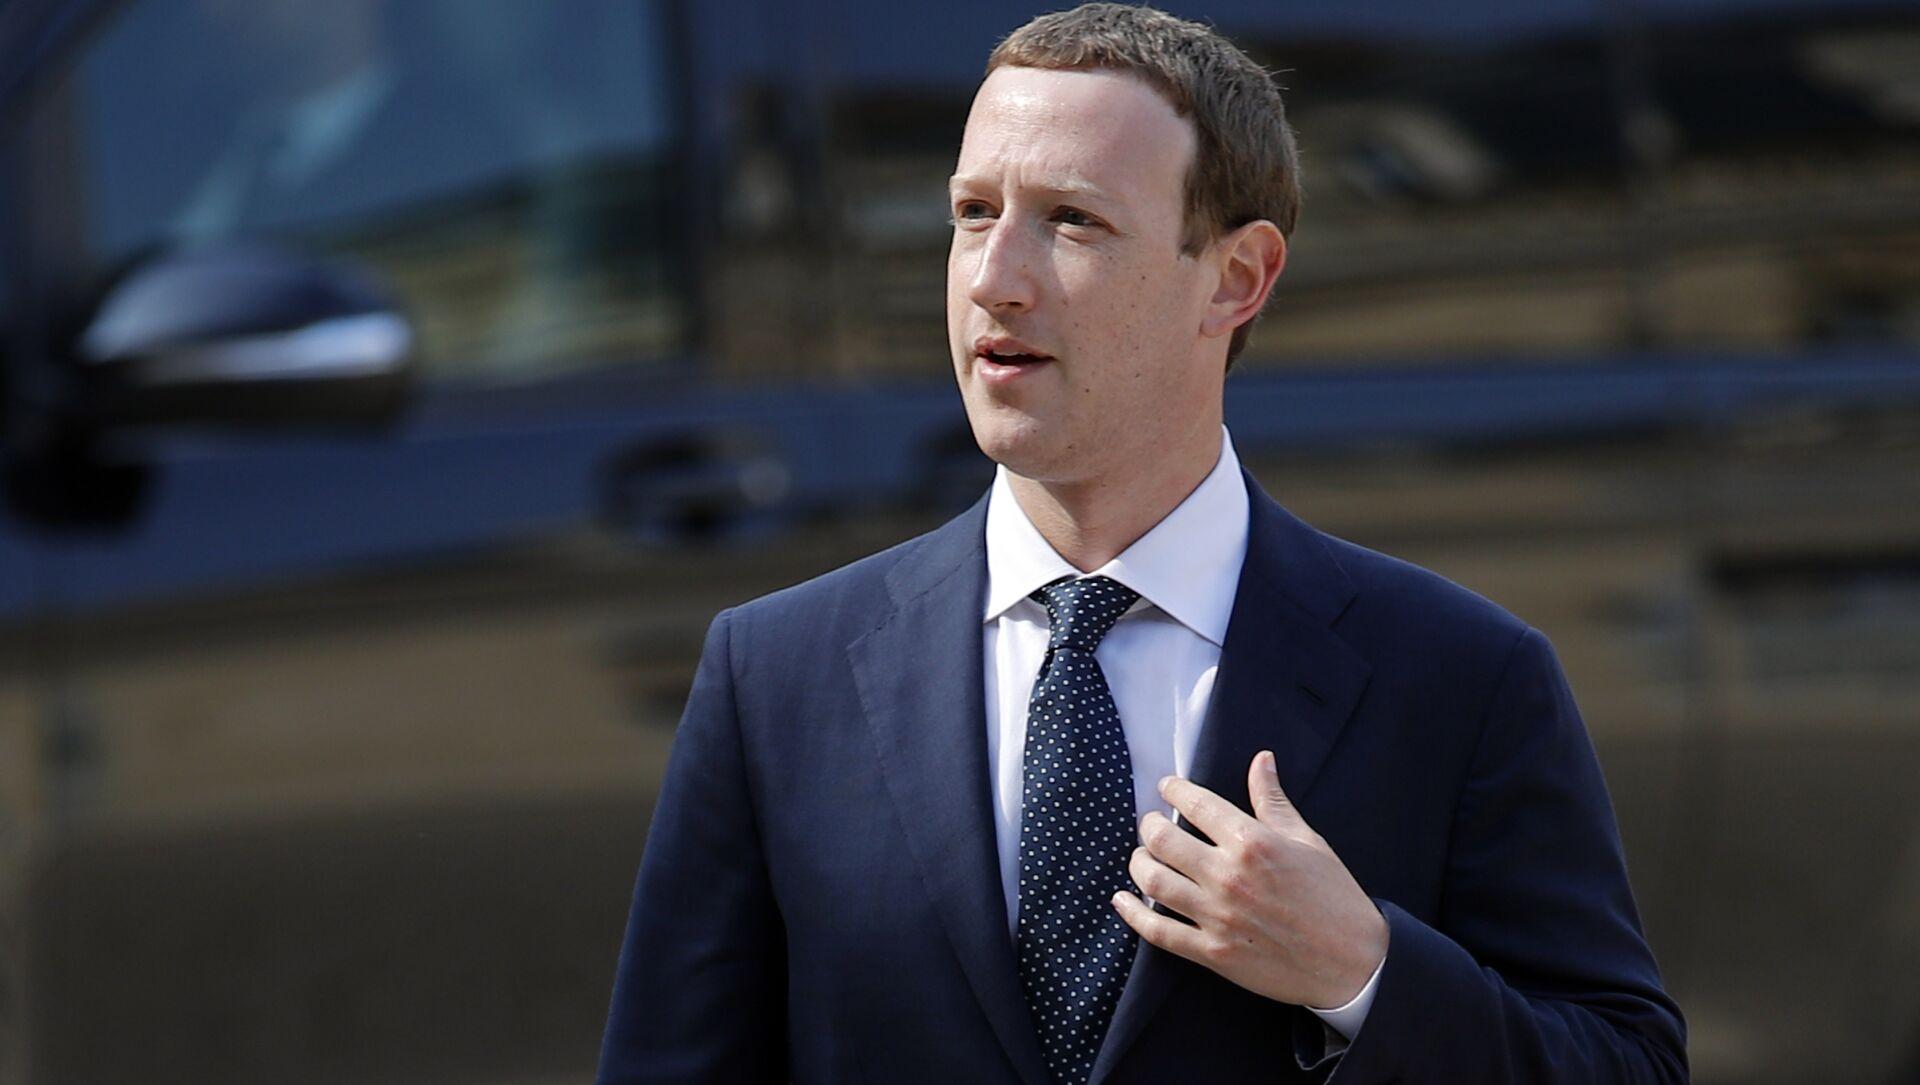 CEO di Facebook Mark Zuckerberg - Sputnik Italia, 1920, 15.05.2021